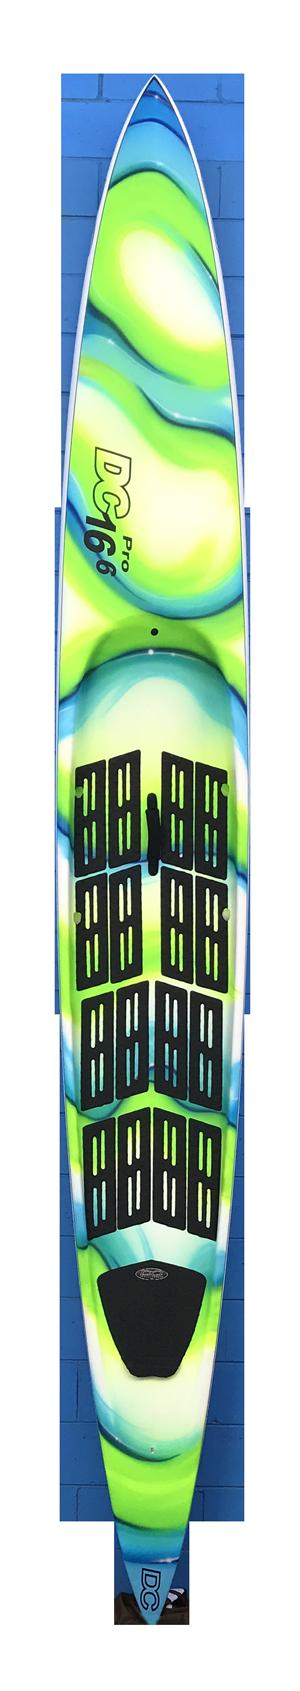 DC16-Pro-fluro-green.png